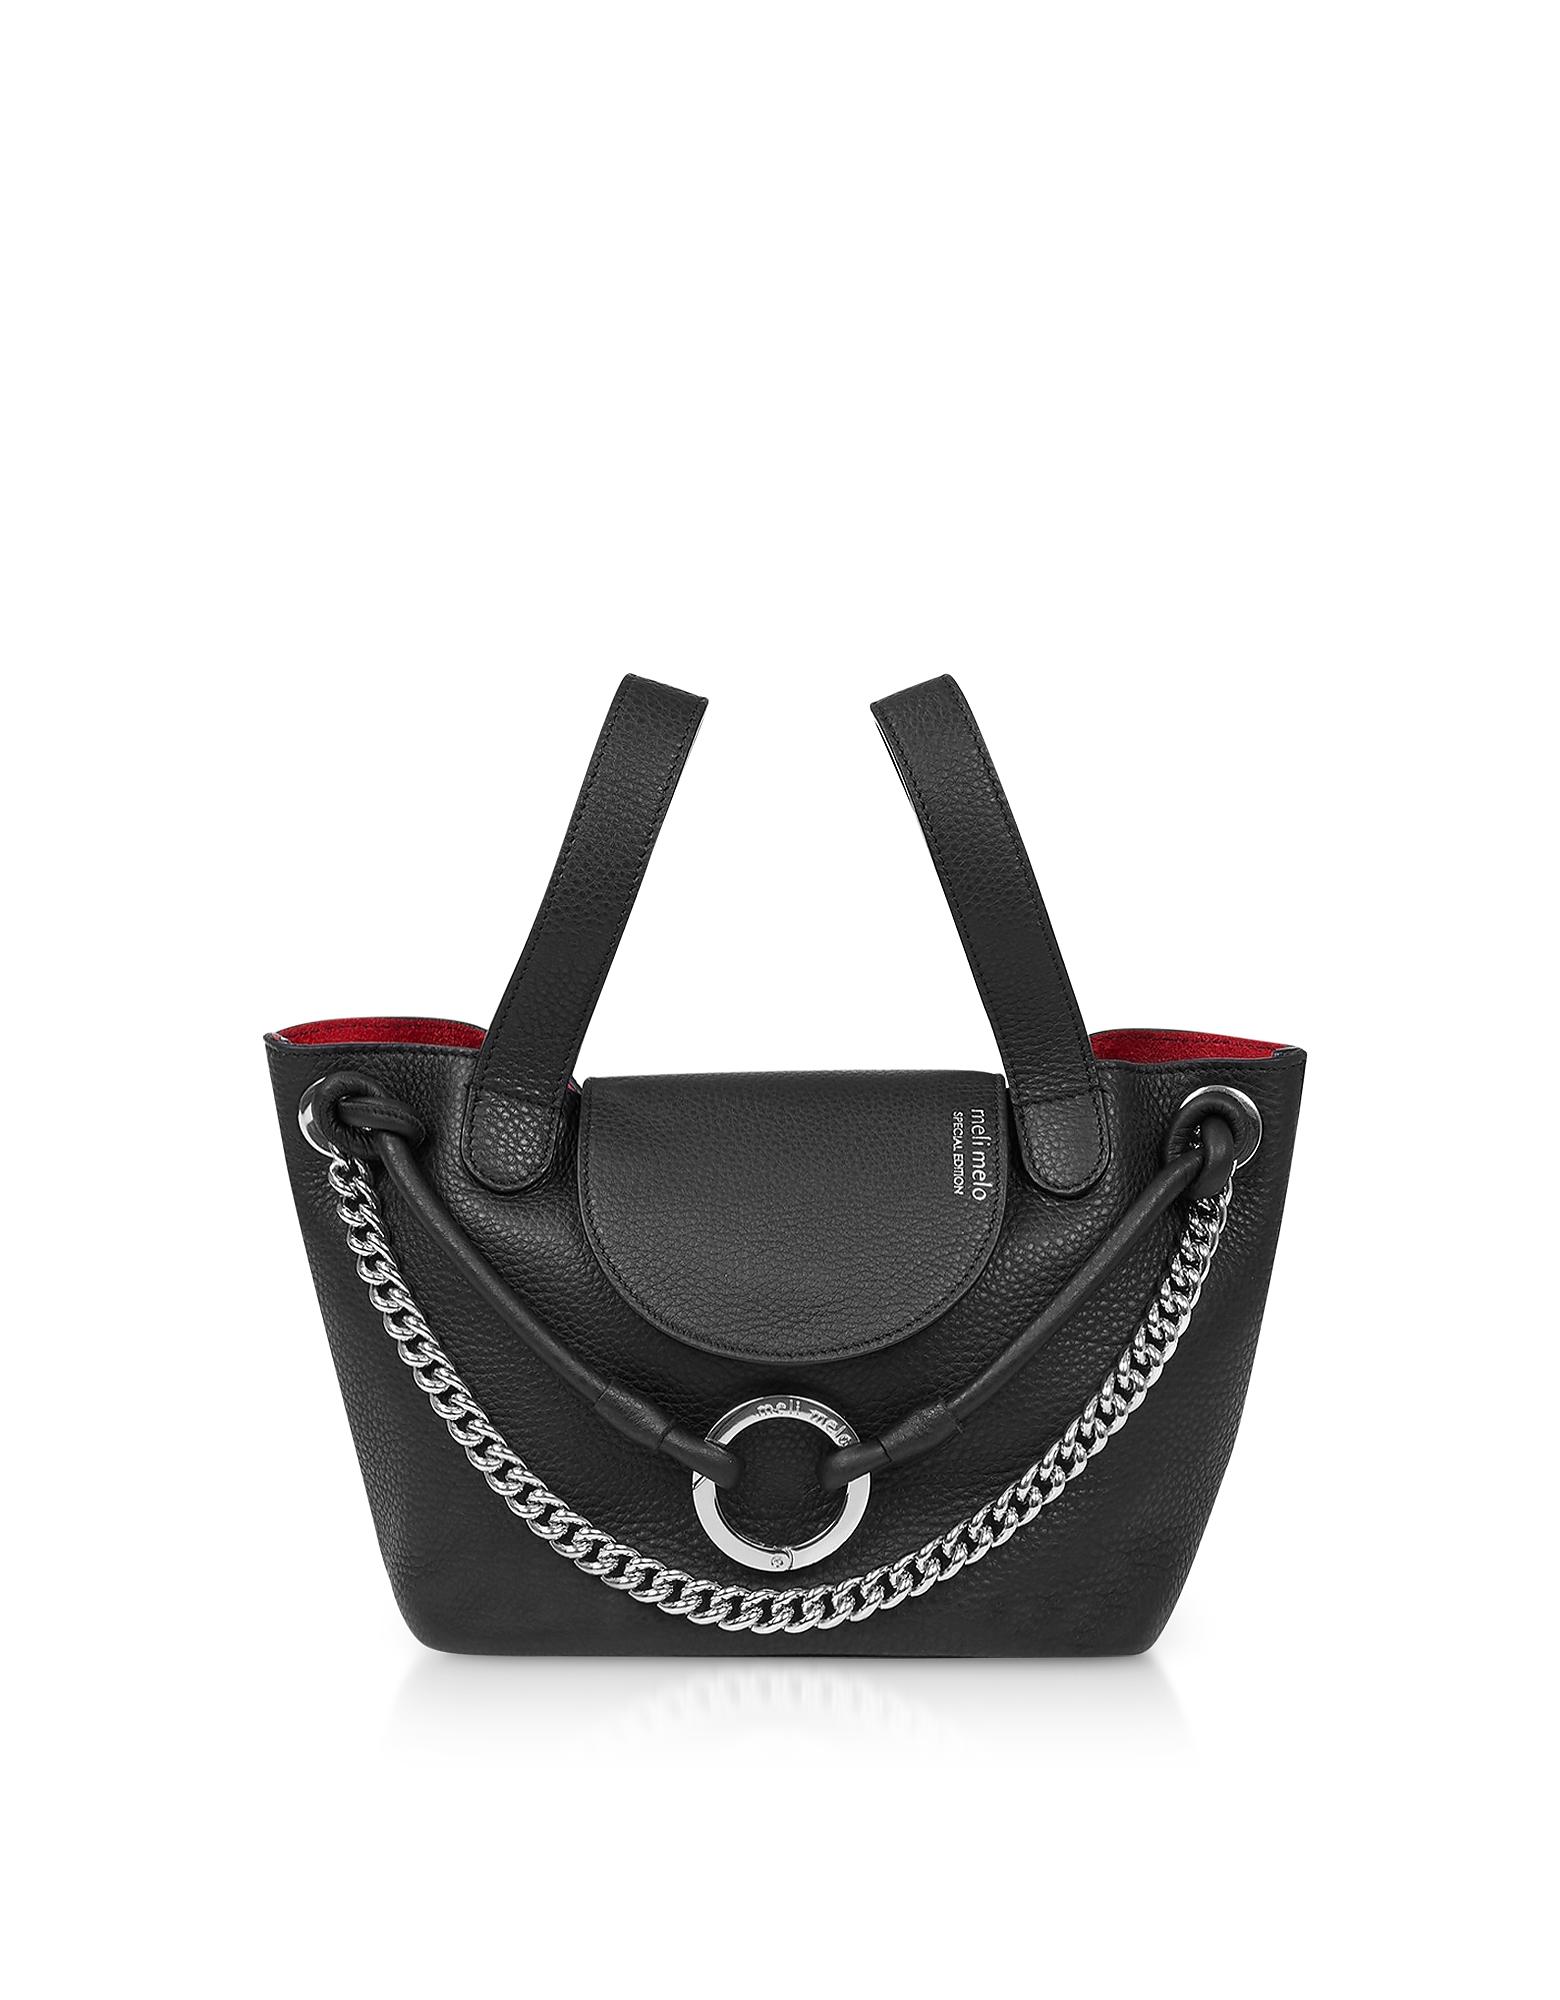 Meli Melo Handbags, Black Linked Thela Mini Bag